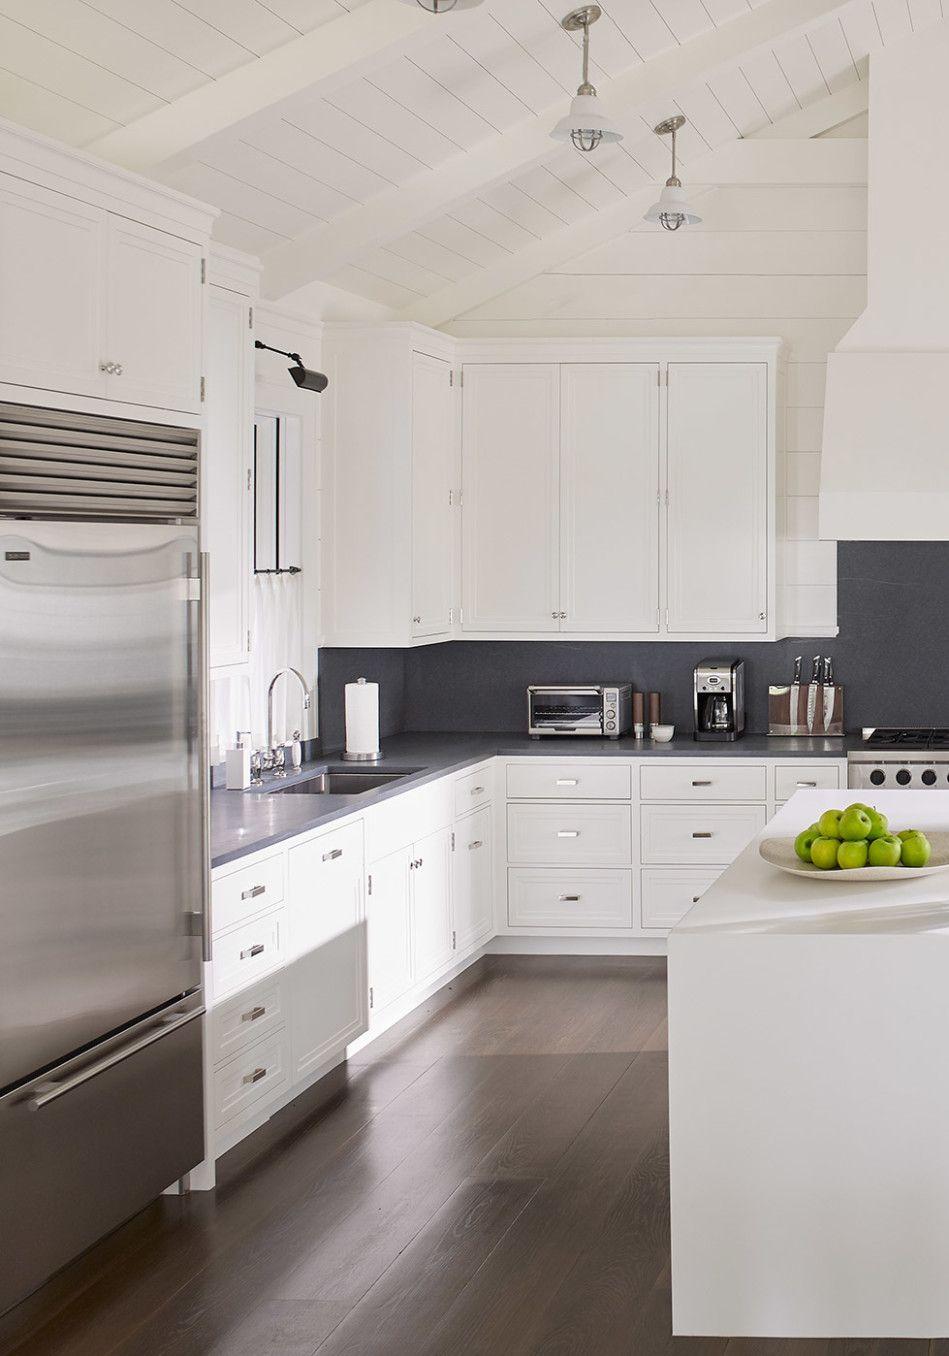 5 Brilliant White Kitchen Decorating Ideas In 2019 Decorating